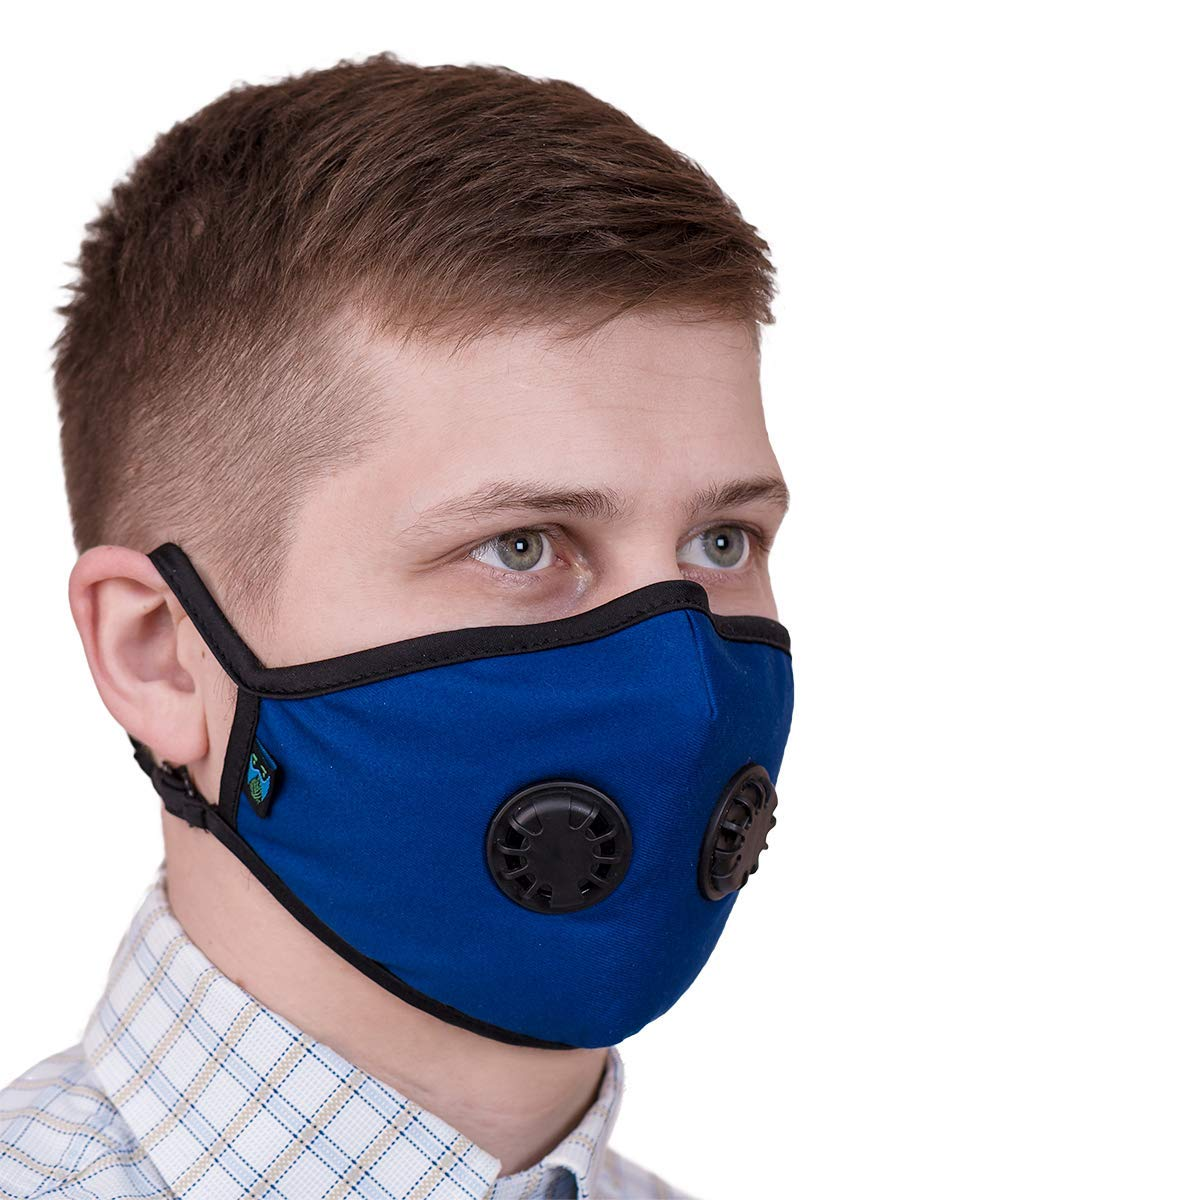 Filter And Particulate Respirator N95 Tecnol Pfr95 Clark Kimberly